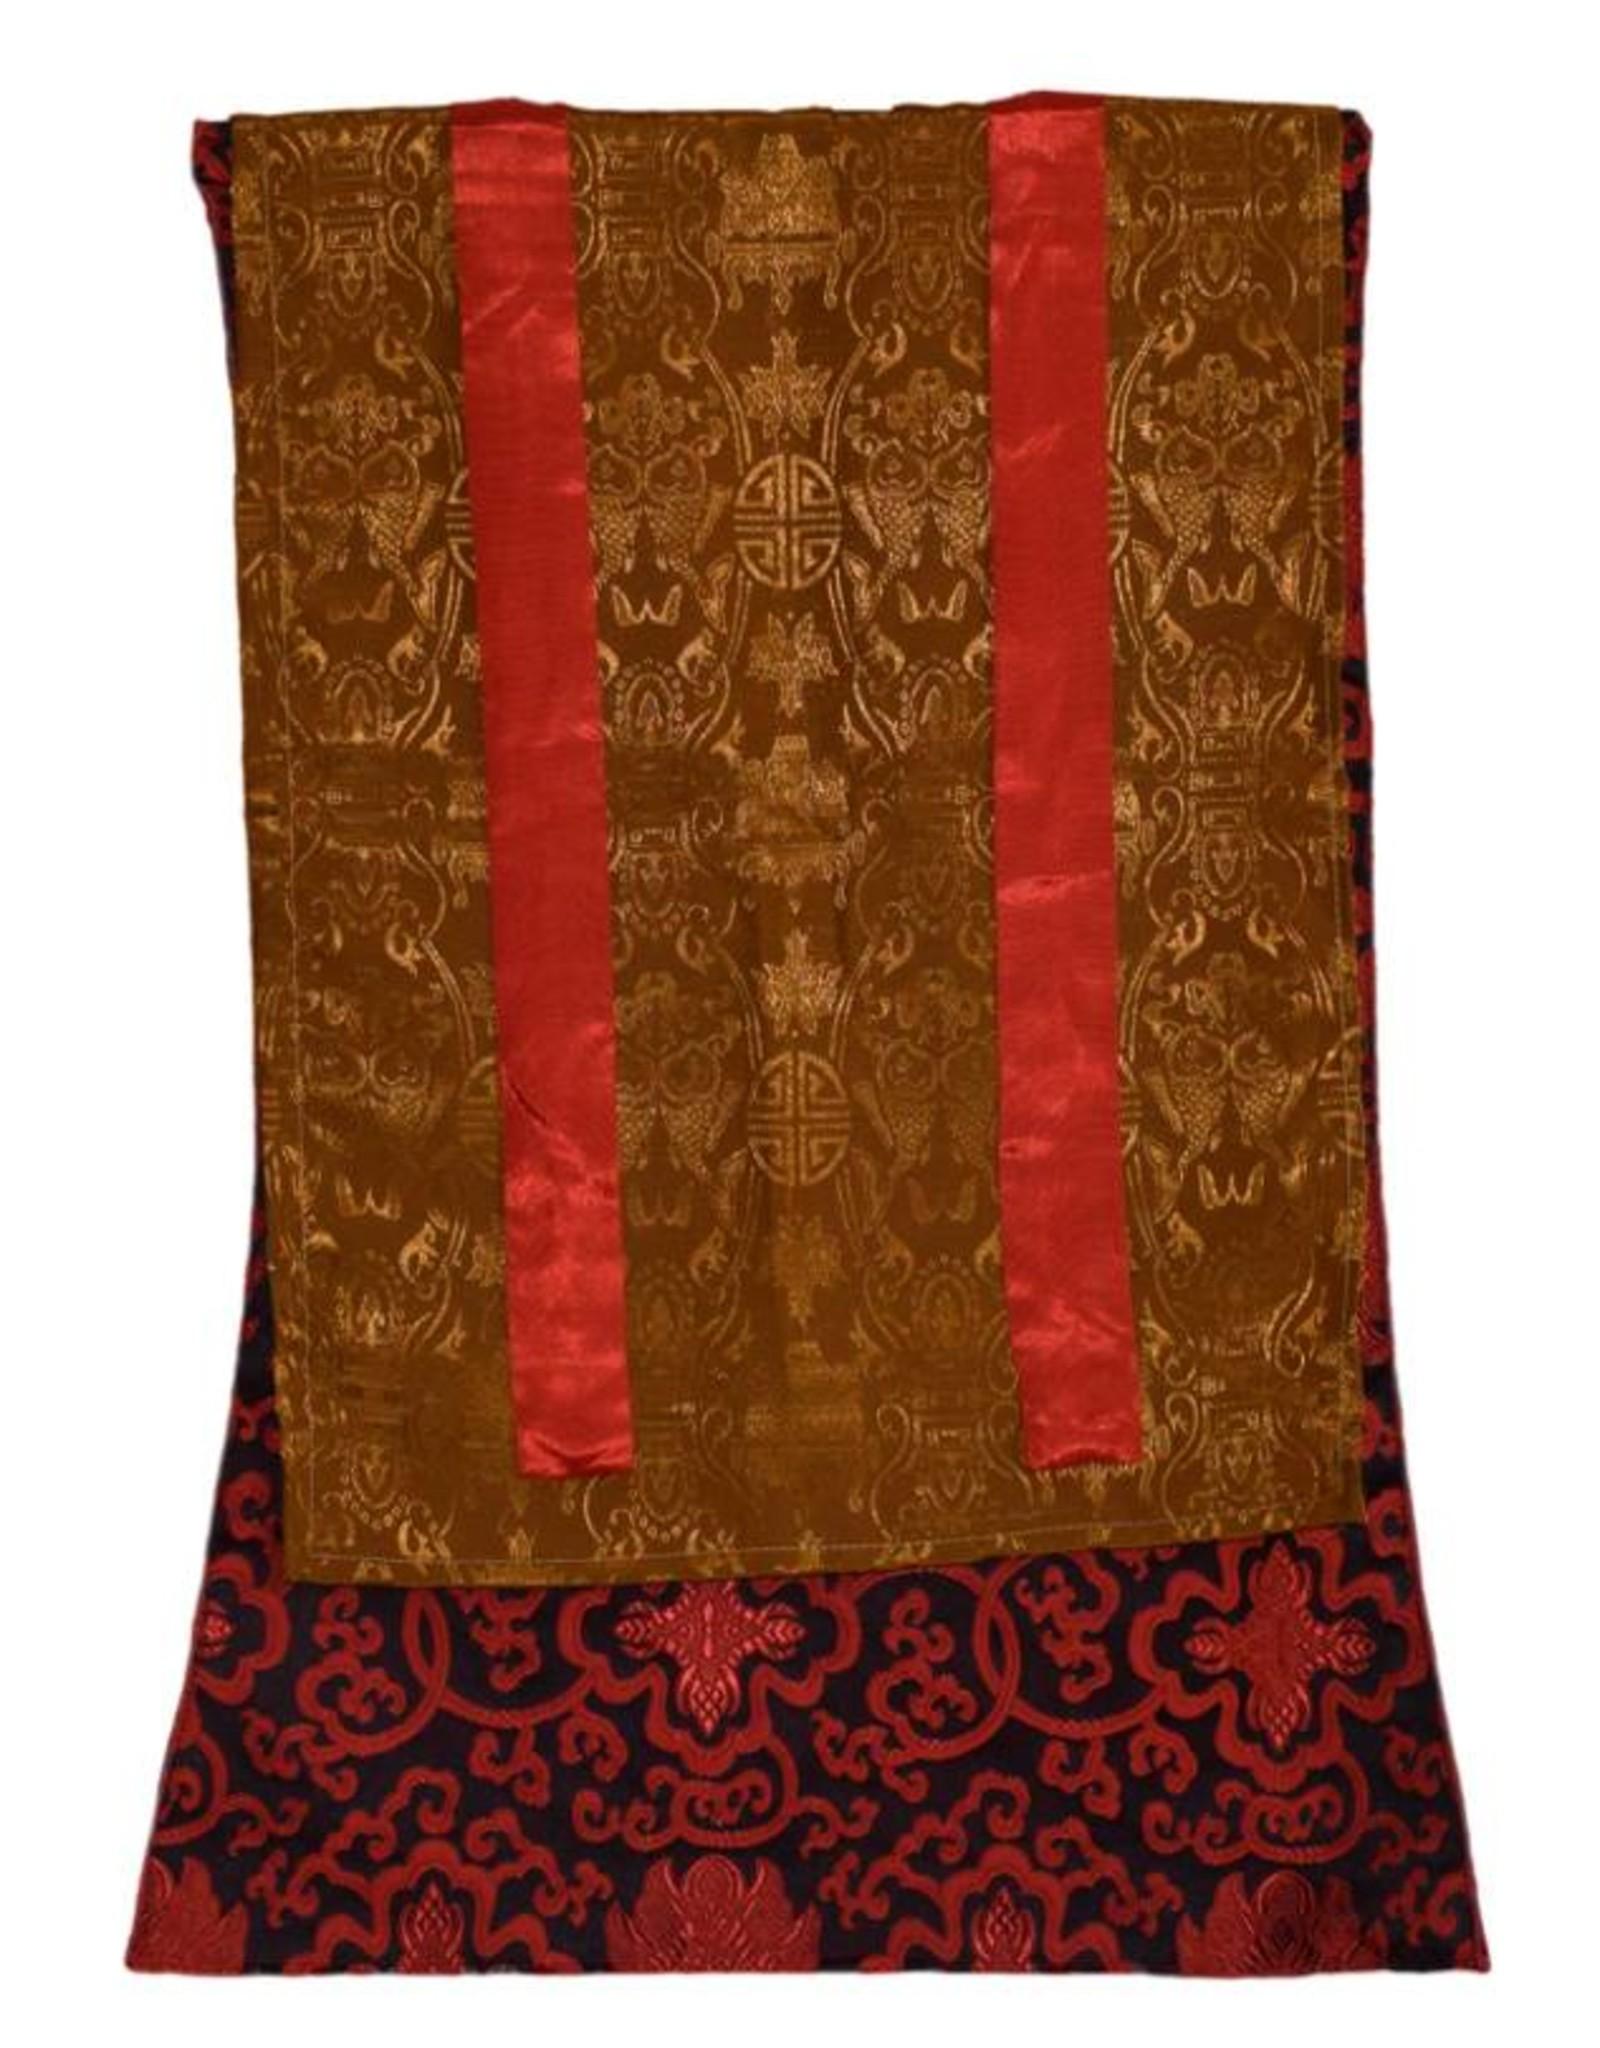 Tibetan Buddhist Art thangka White Tara